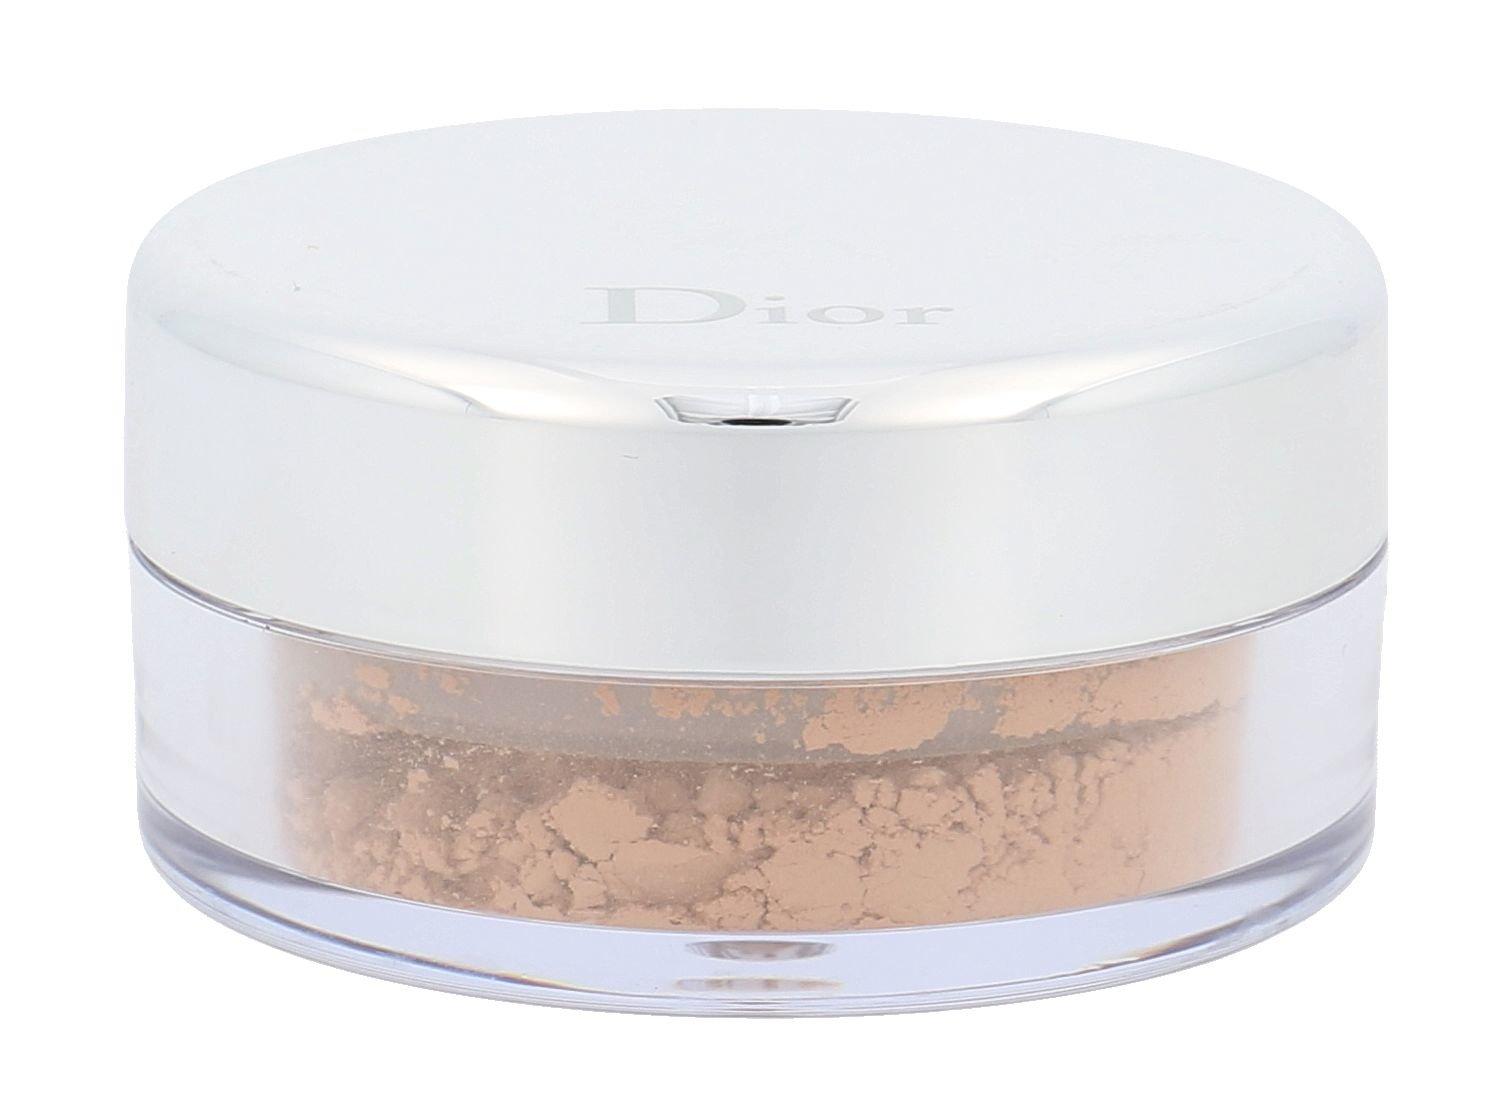 Christian Dior Diorskin Nude Cosmetic 2,2ml 030 Medium Beige